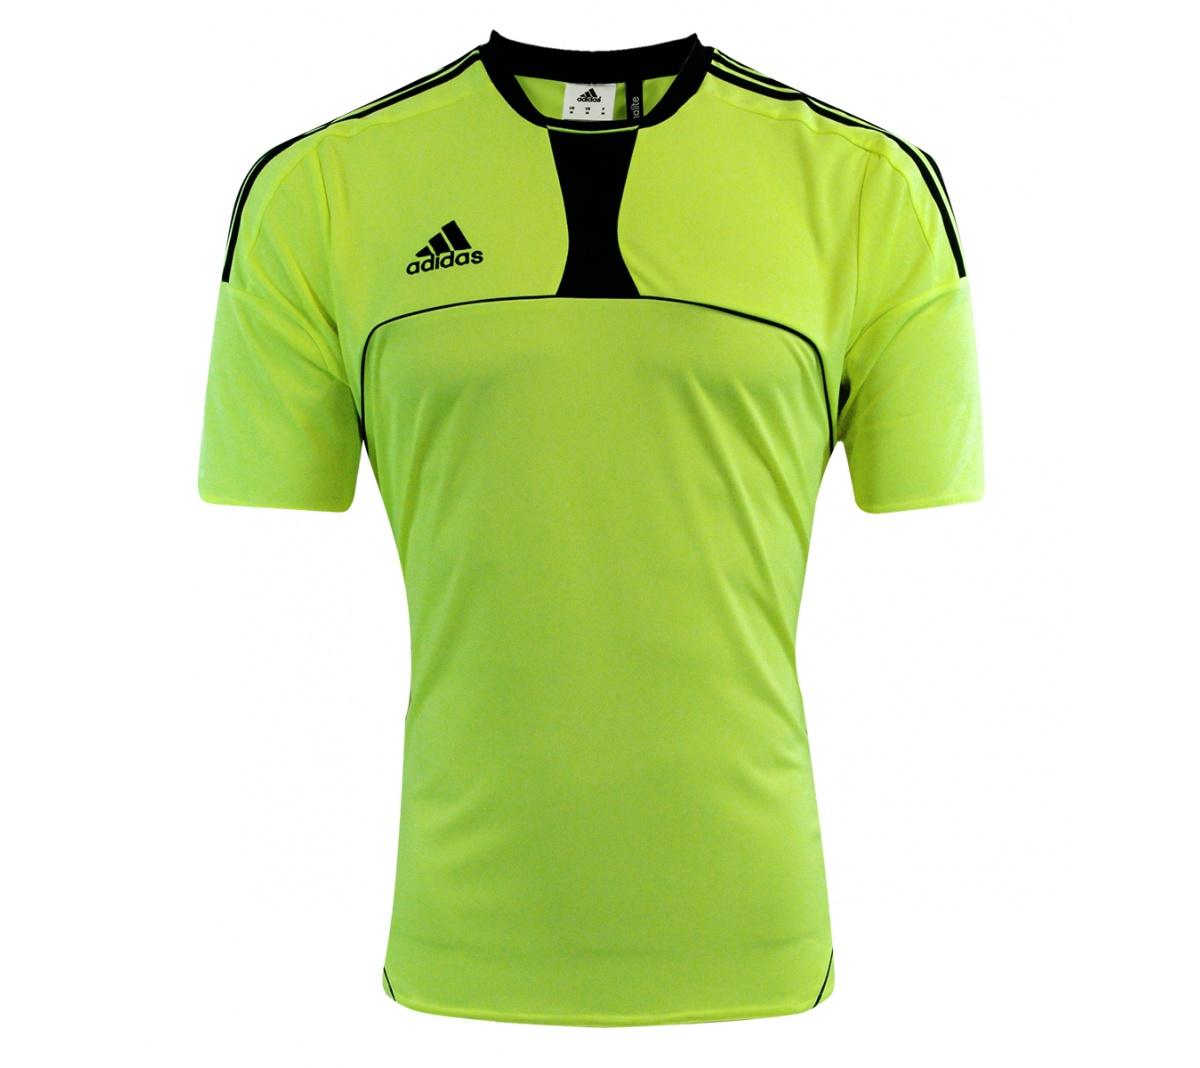 Camisa Adidas Pepe Camisa Adidas Pepe ... ba79cd39e7f9b